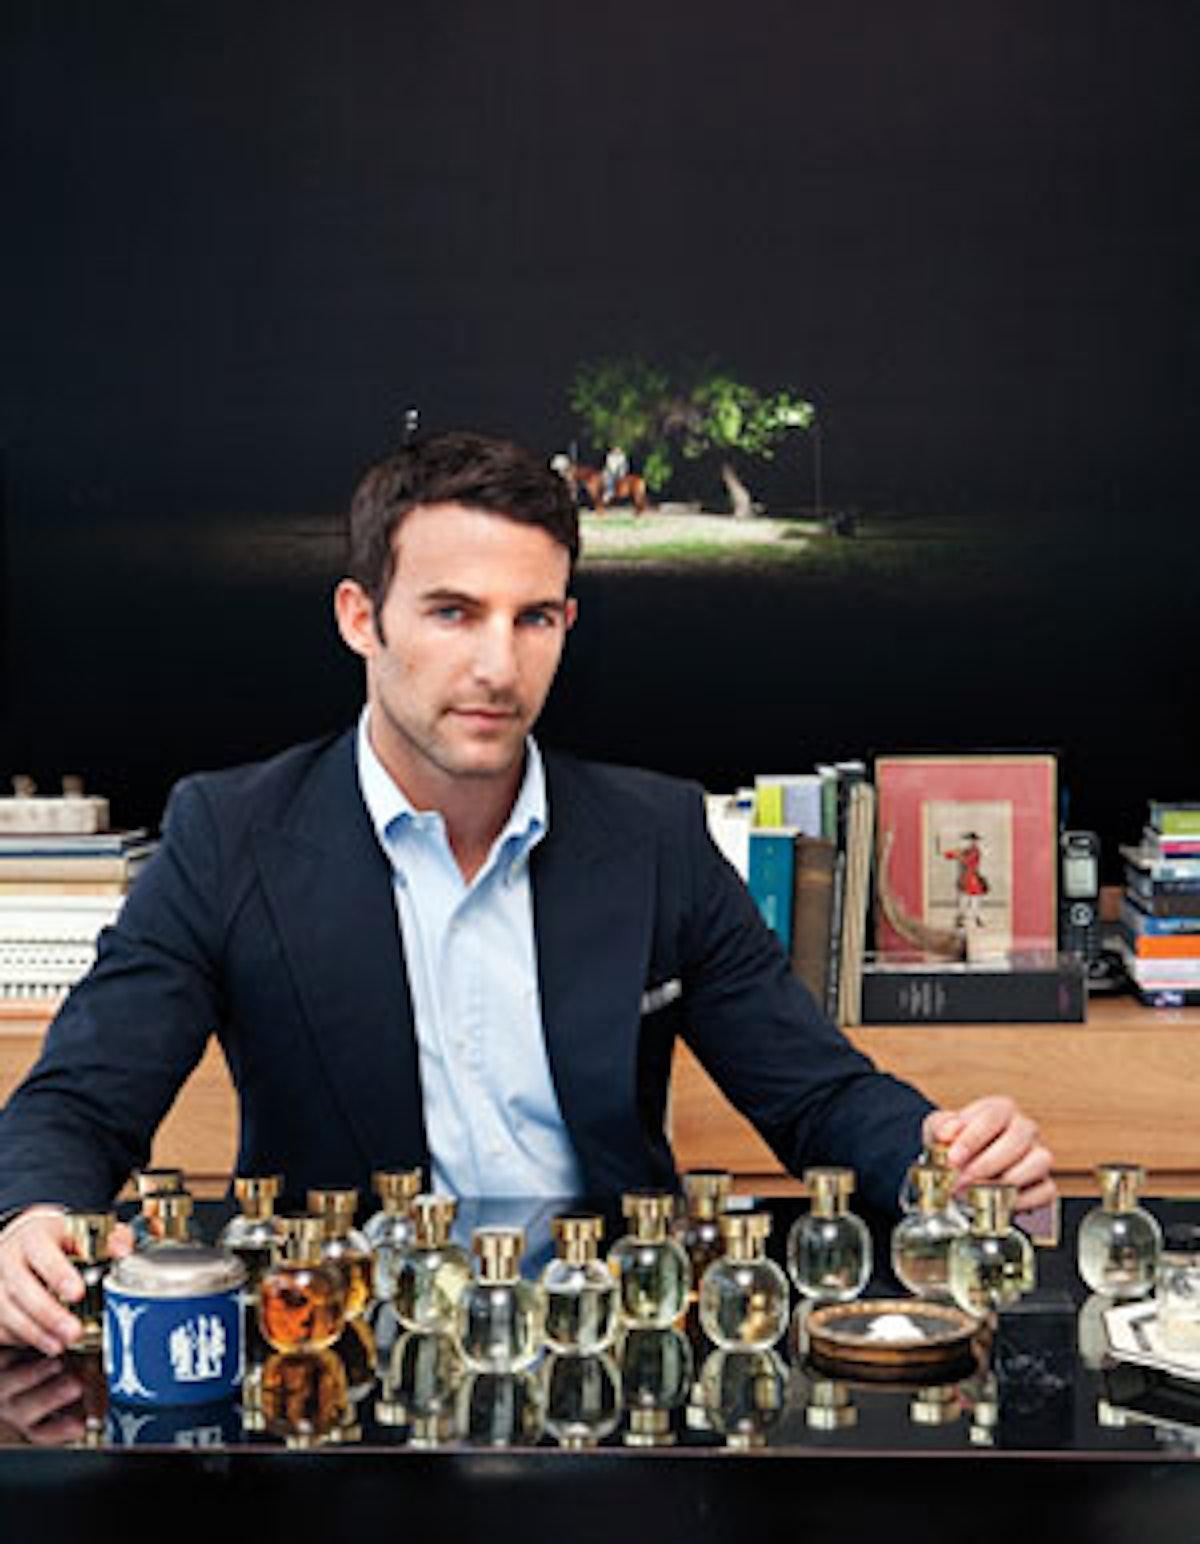 bear-architect-turned-perfumer-v.jpg